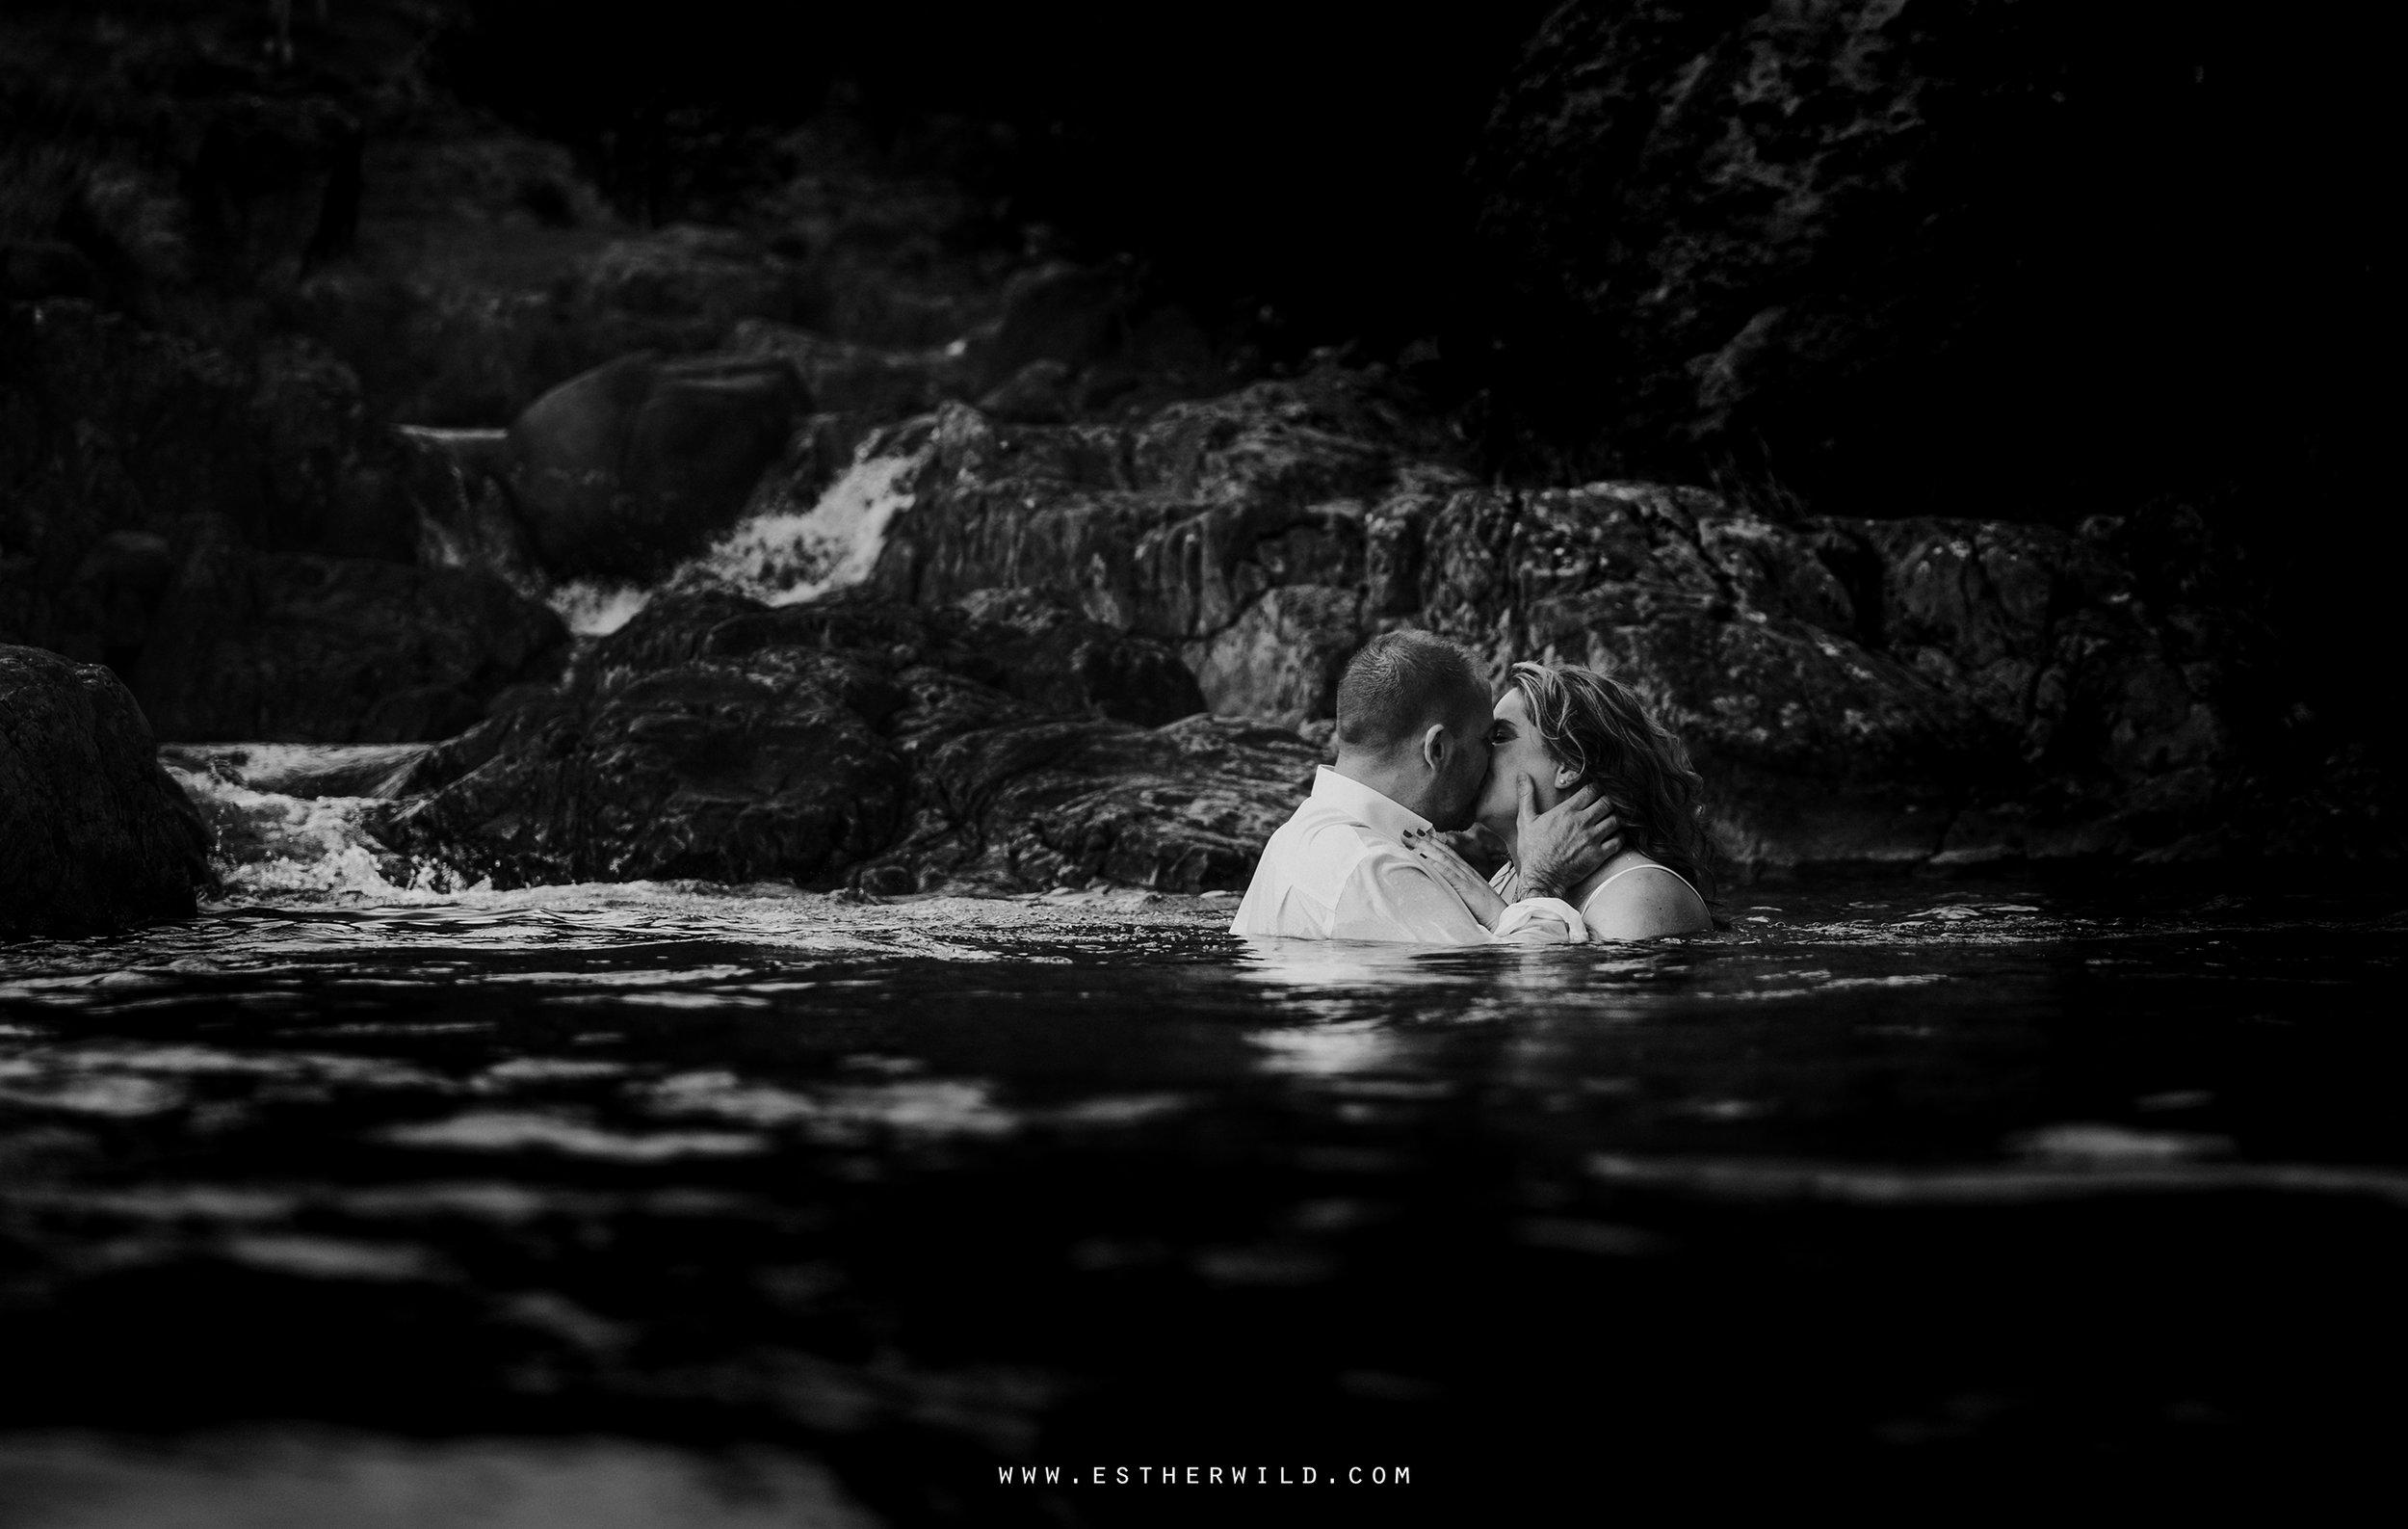 Cumbria_Lake_District_Wasdale_Wedding_Photographer_Destination_Engagement_Anniversary_Esther_Wild_IMG_4404.jpg